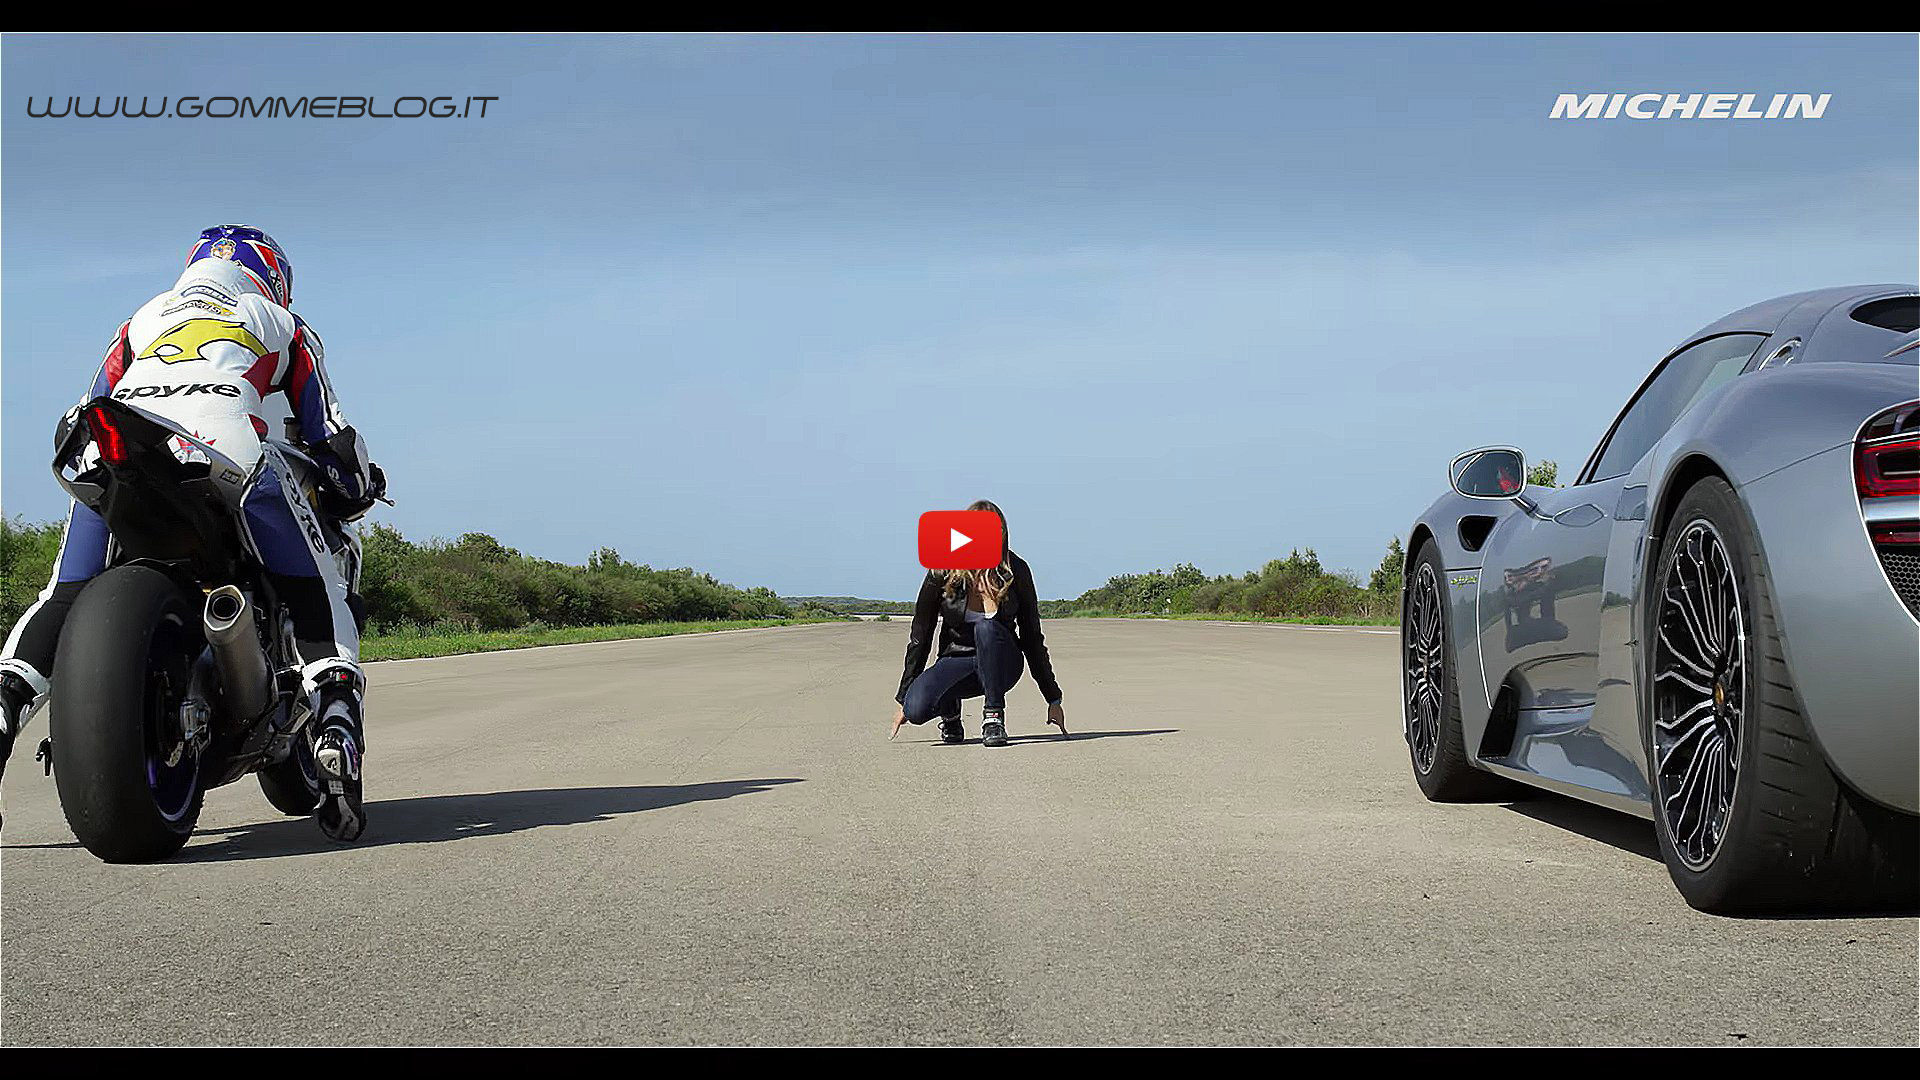 Porsche 918 Spyder VS Yamaha YZF R1 - VIDEO - Michelin #WeAreAllRacers 8